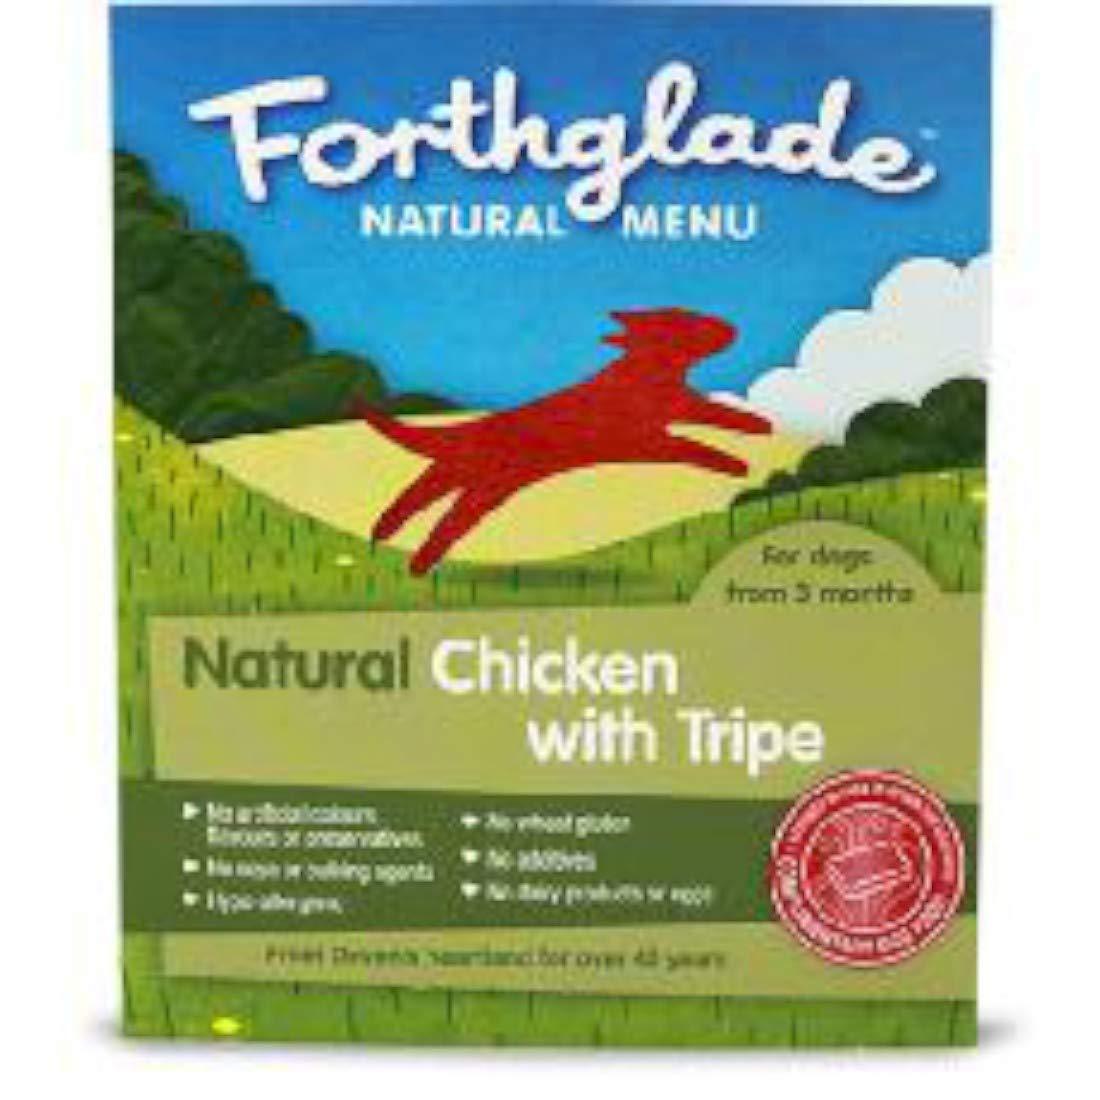 Forthglade Natural Menu Chicken & Tripe (18 x 395g) by Forthglade